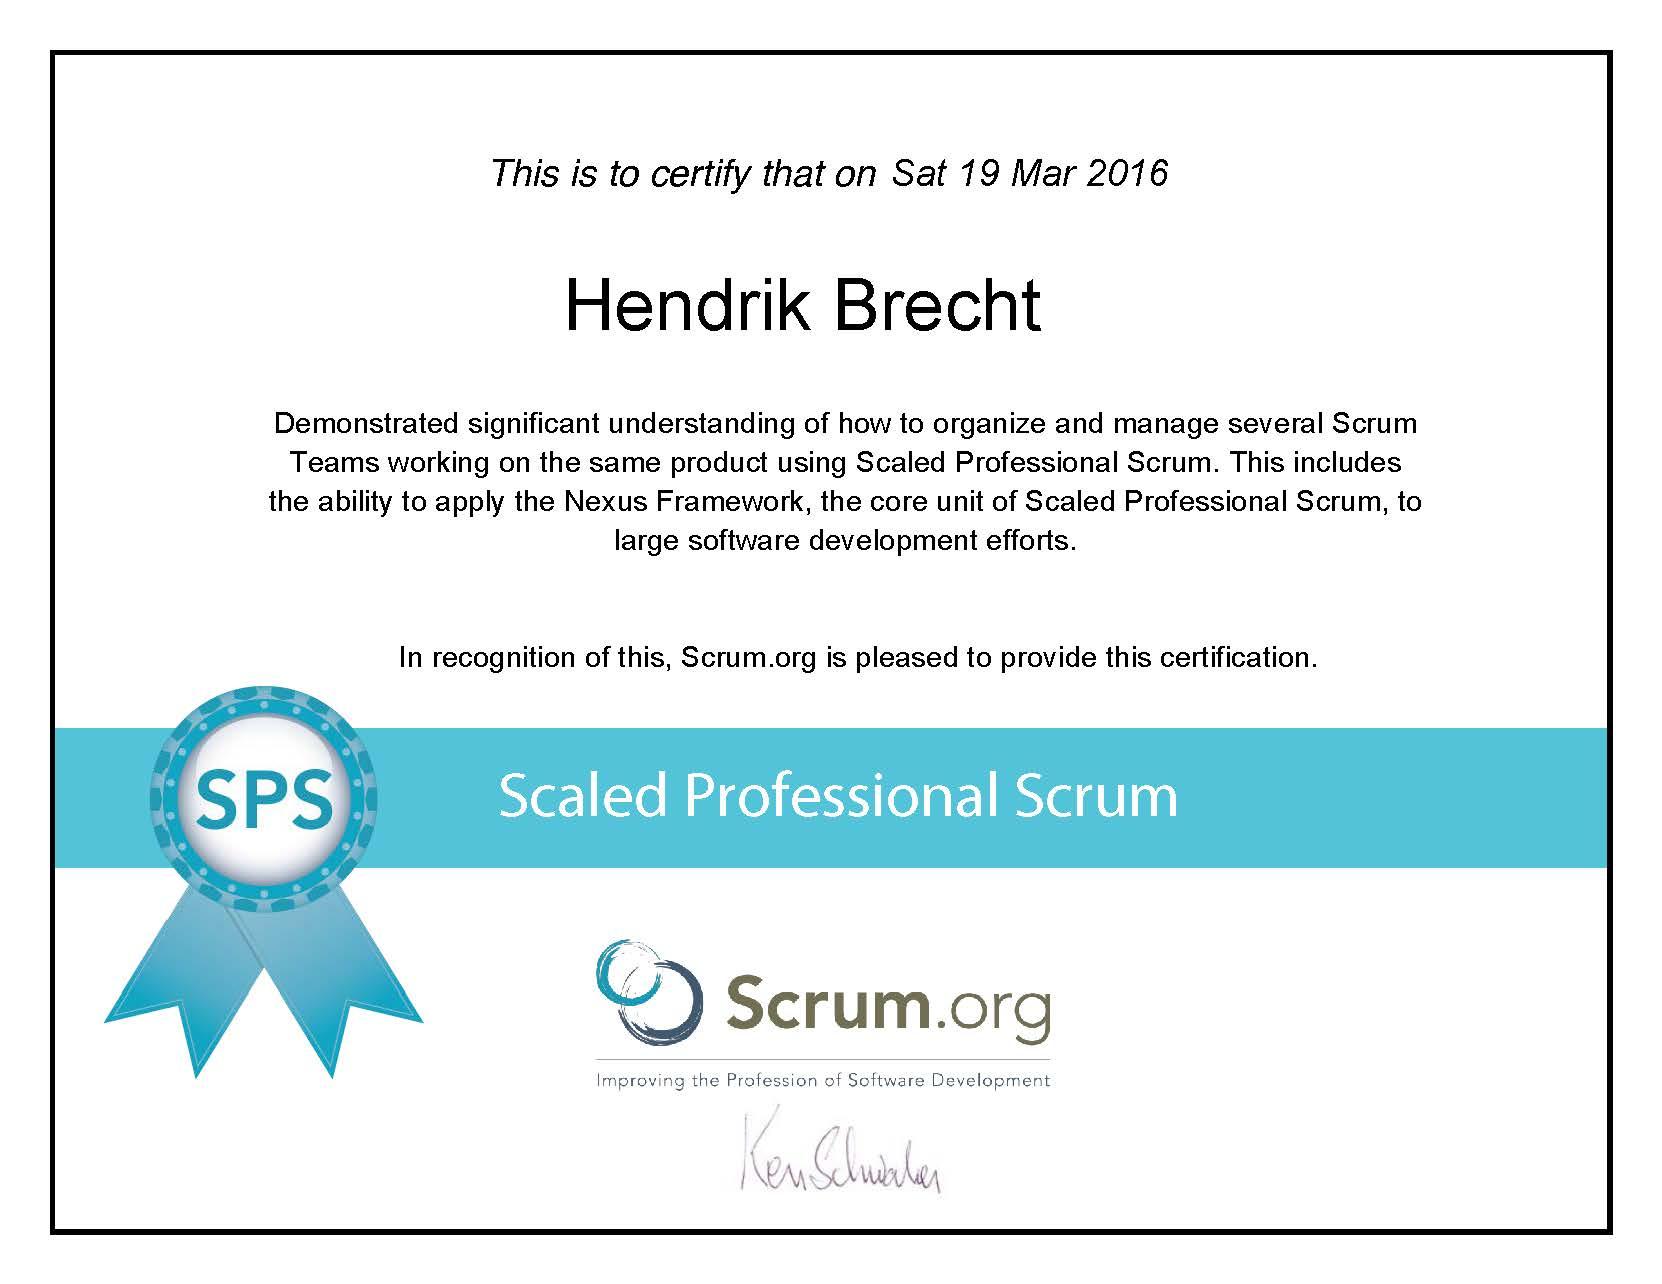 Hendrik Brecht - SPS Scaled Professional Scrum - 2016